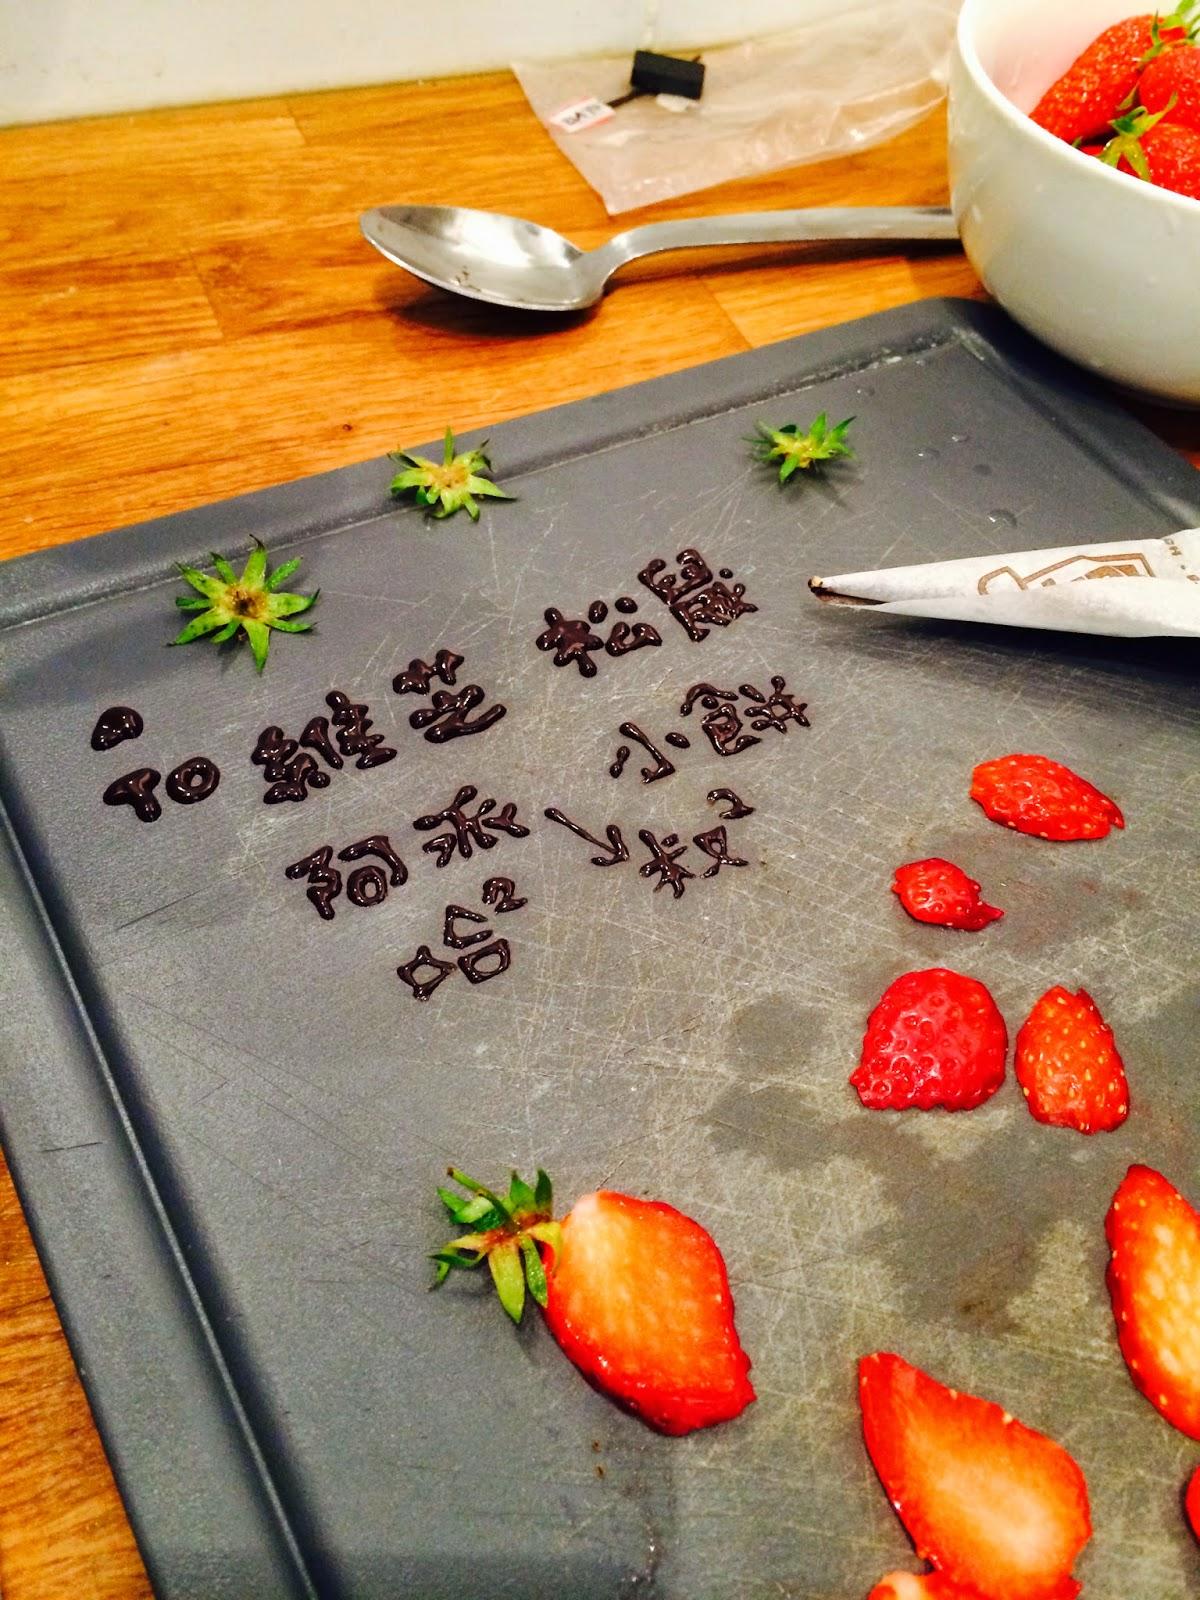 all YU can Bake / Eva is everywhere : [ All YU can bake] 愛心甜點 - 法式燒餅 (自取名)